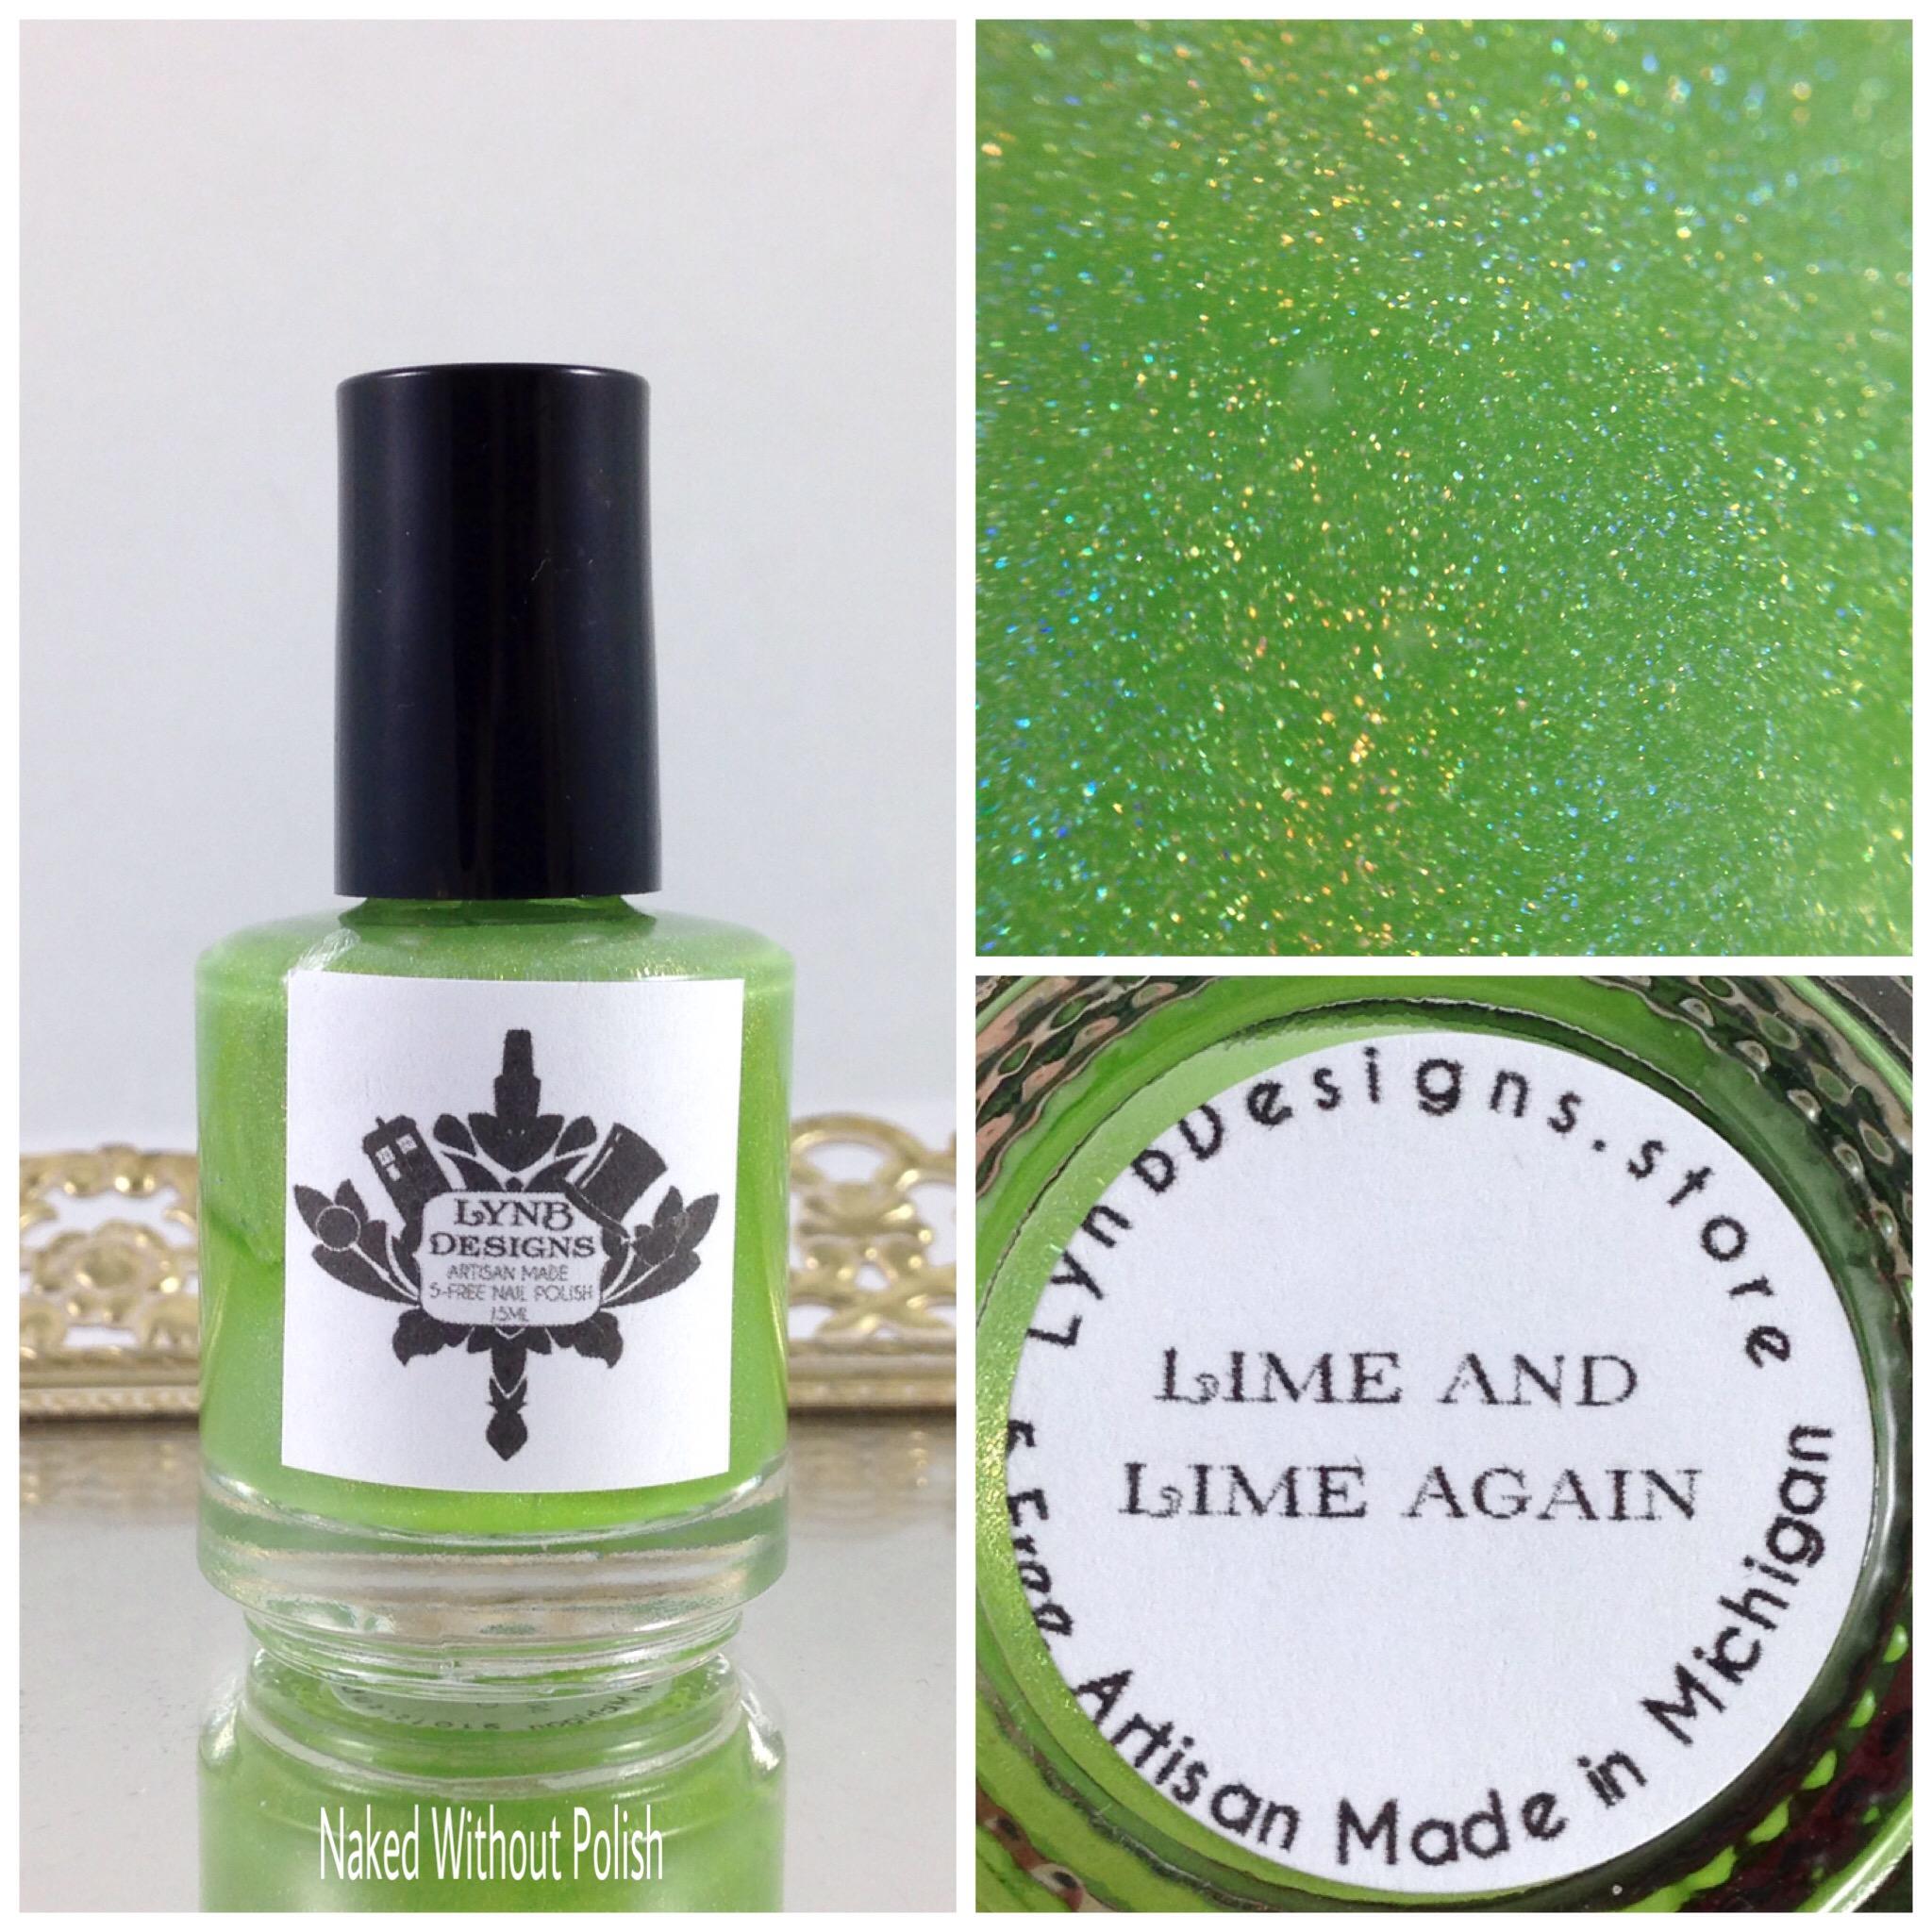 LynBDesigns-Lime-and-Lime-Again-1